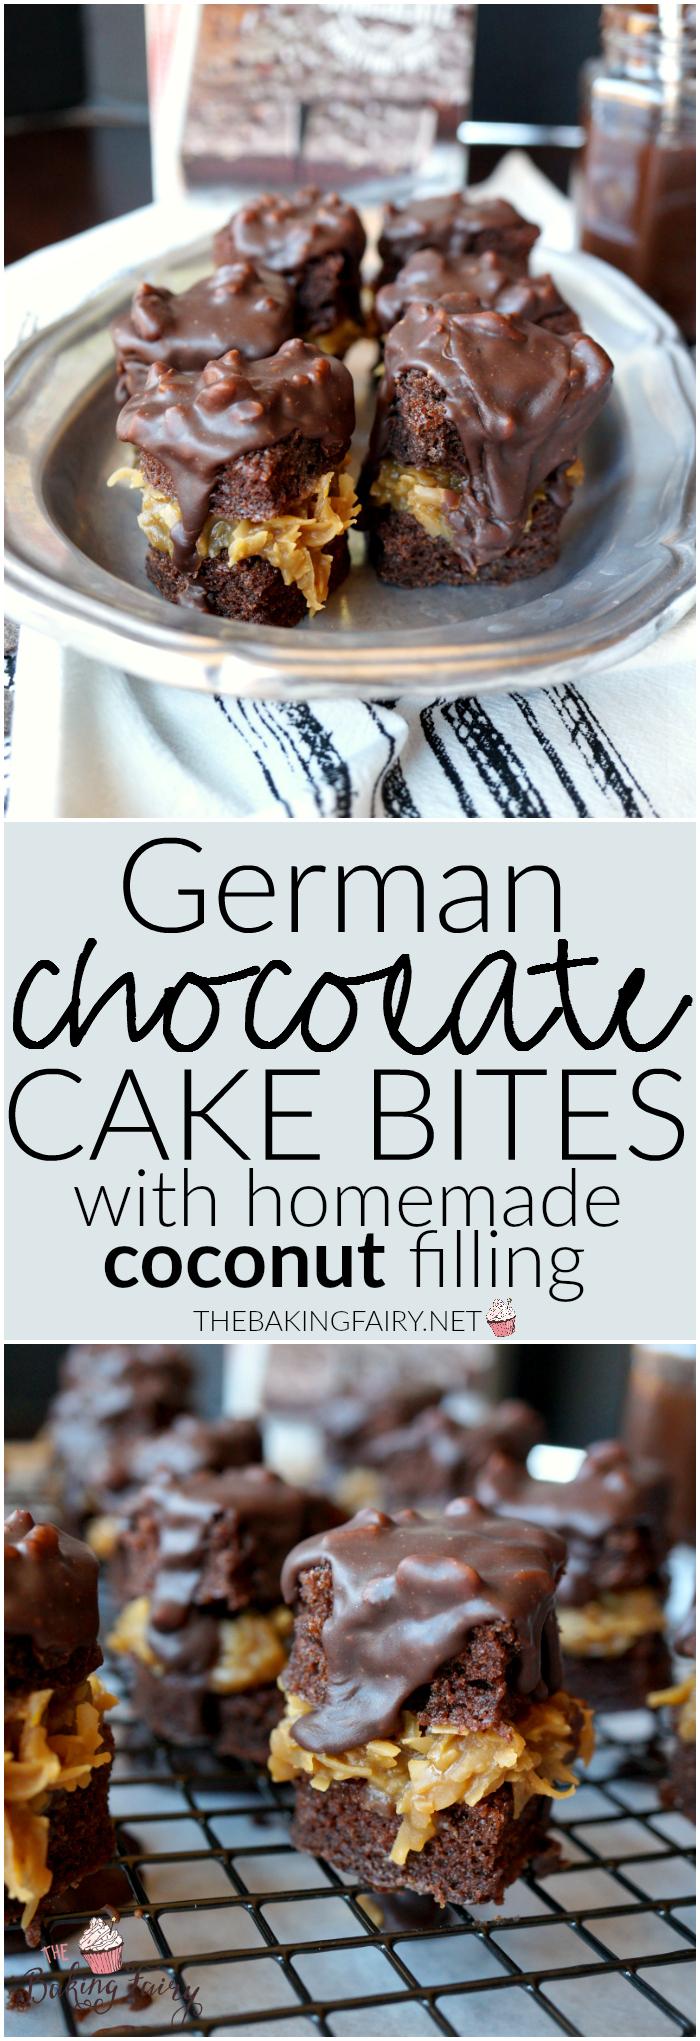 german chocolate cake bites | The Baking Fairy